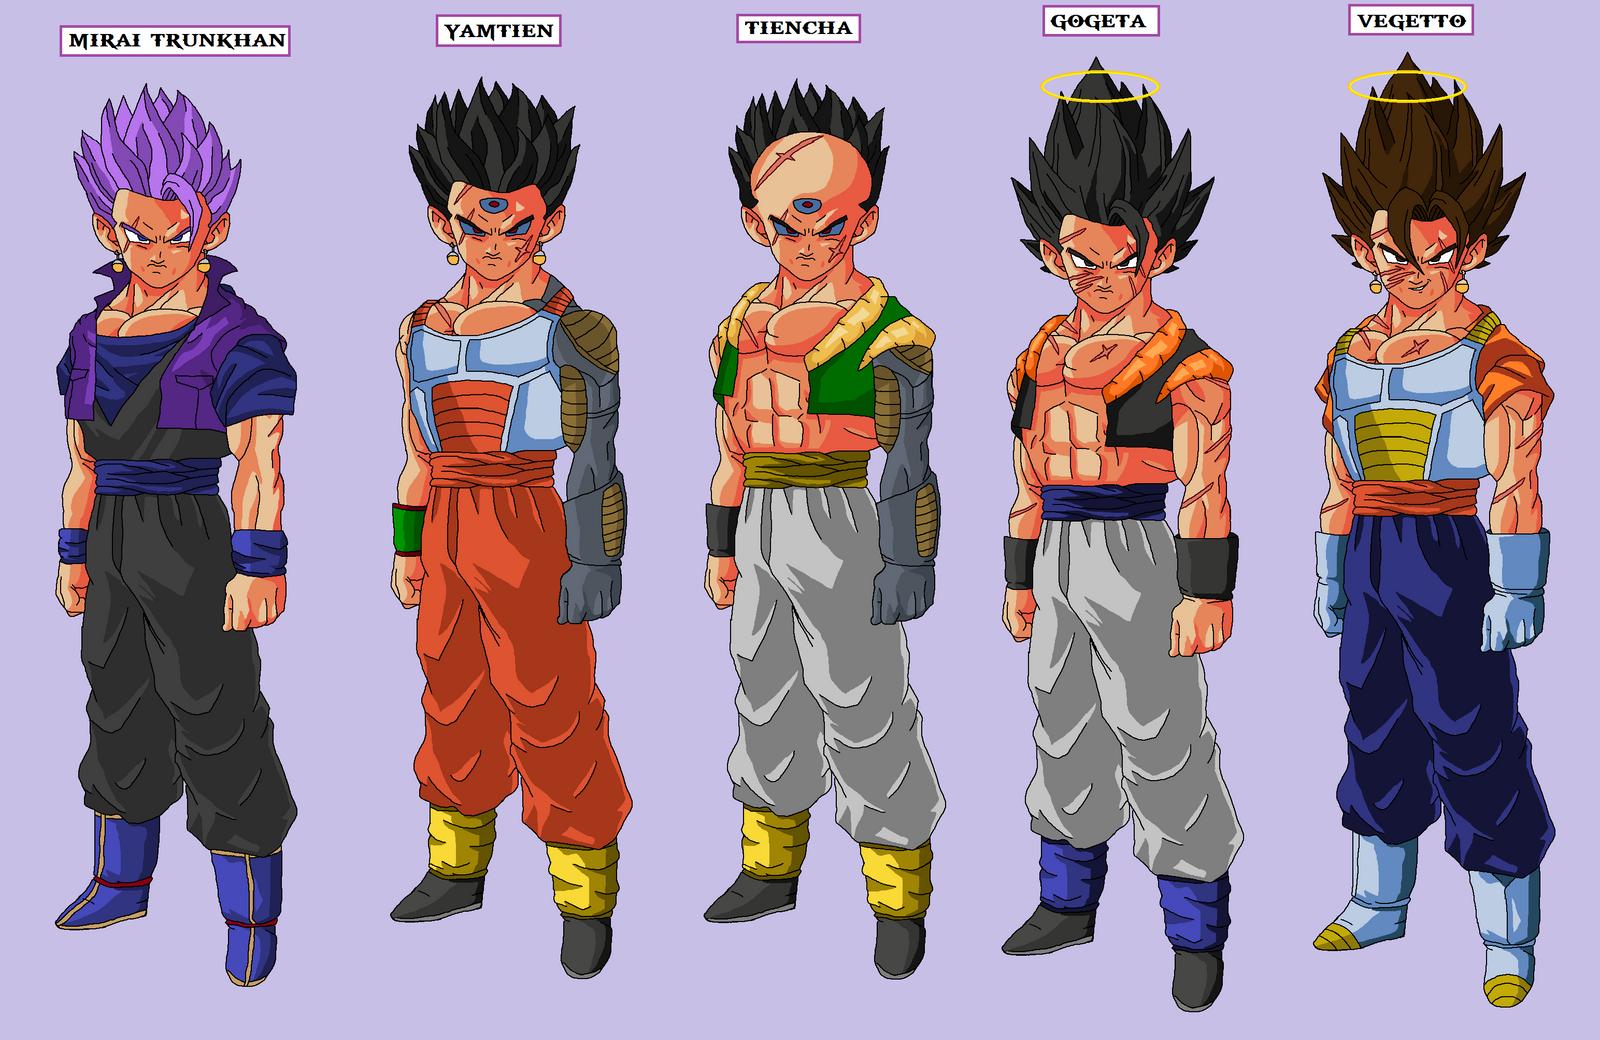 Dbaf Goku And Gohan Fused http   naruttebayo67 deviantart com art    Goku And Gohan Fusion Ssj4